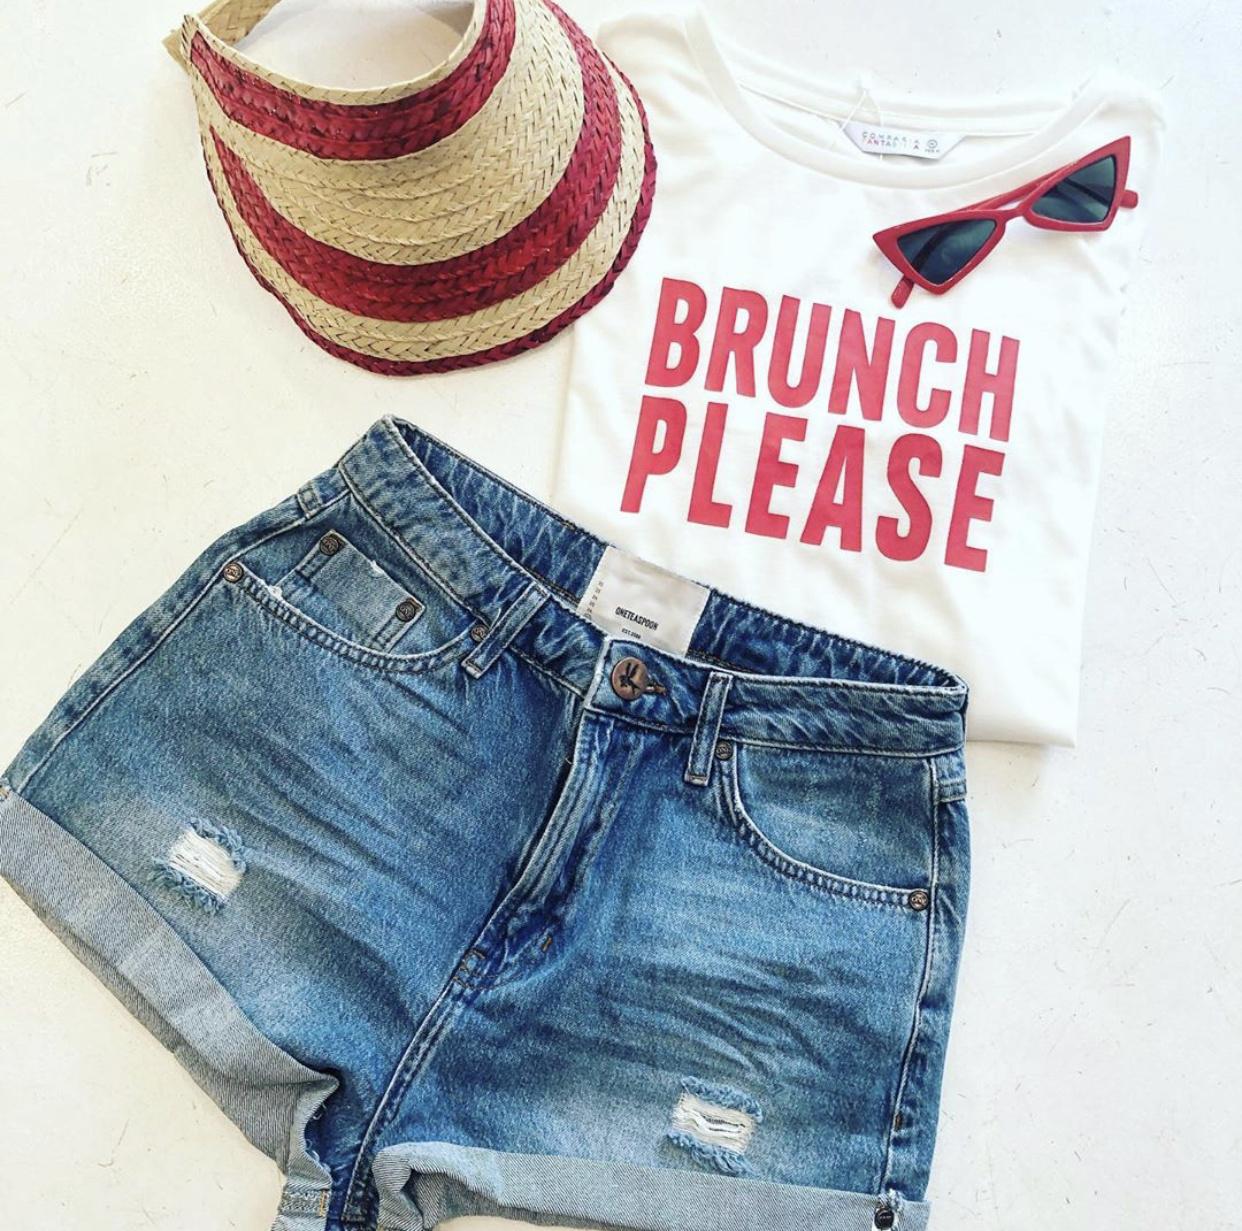 Brunch Please T-Shirt